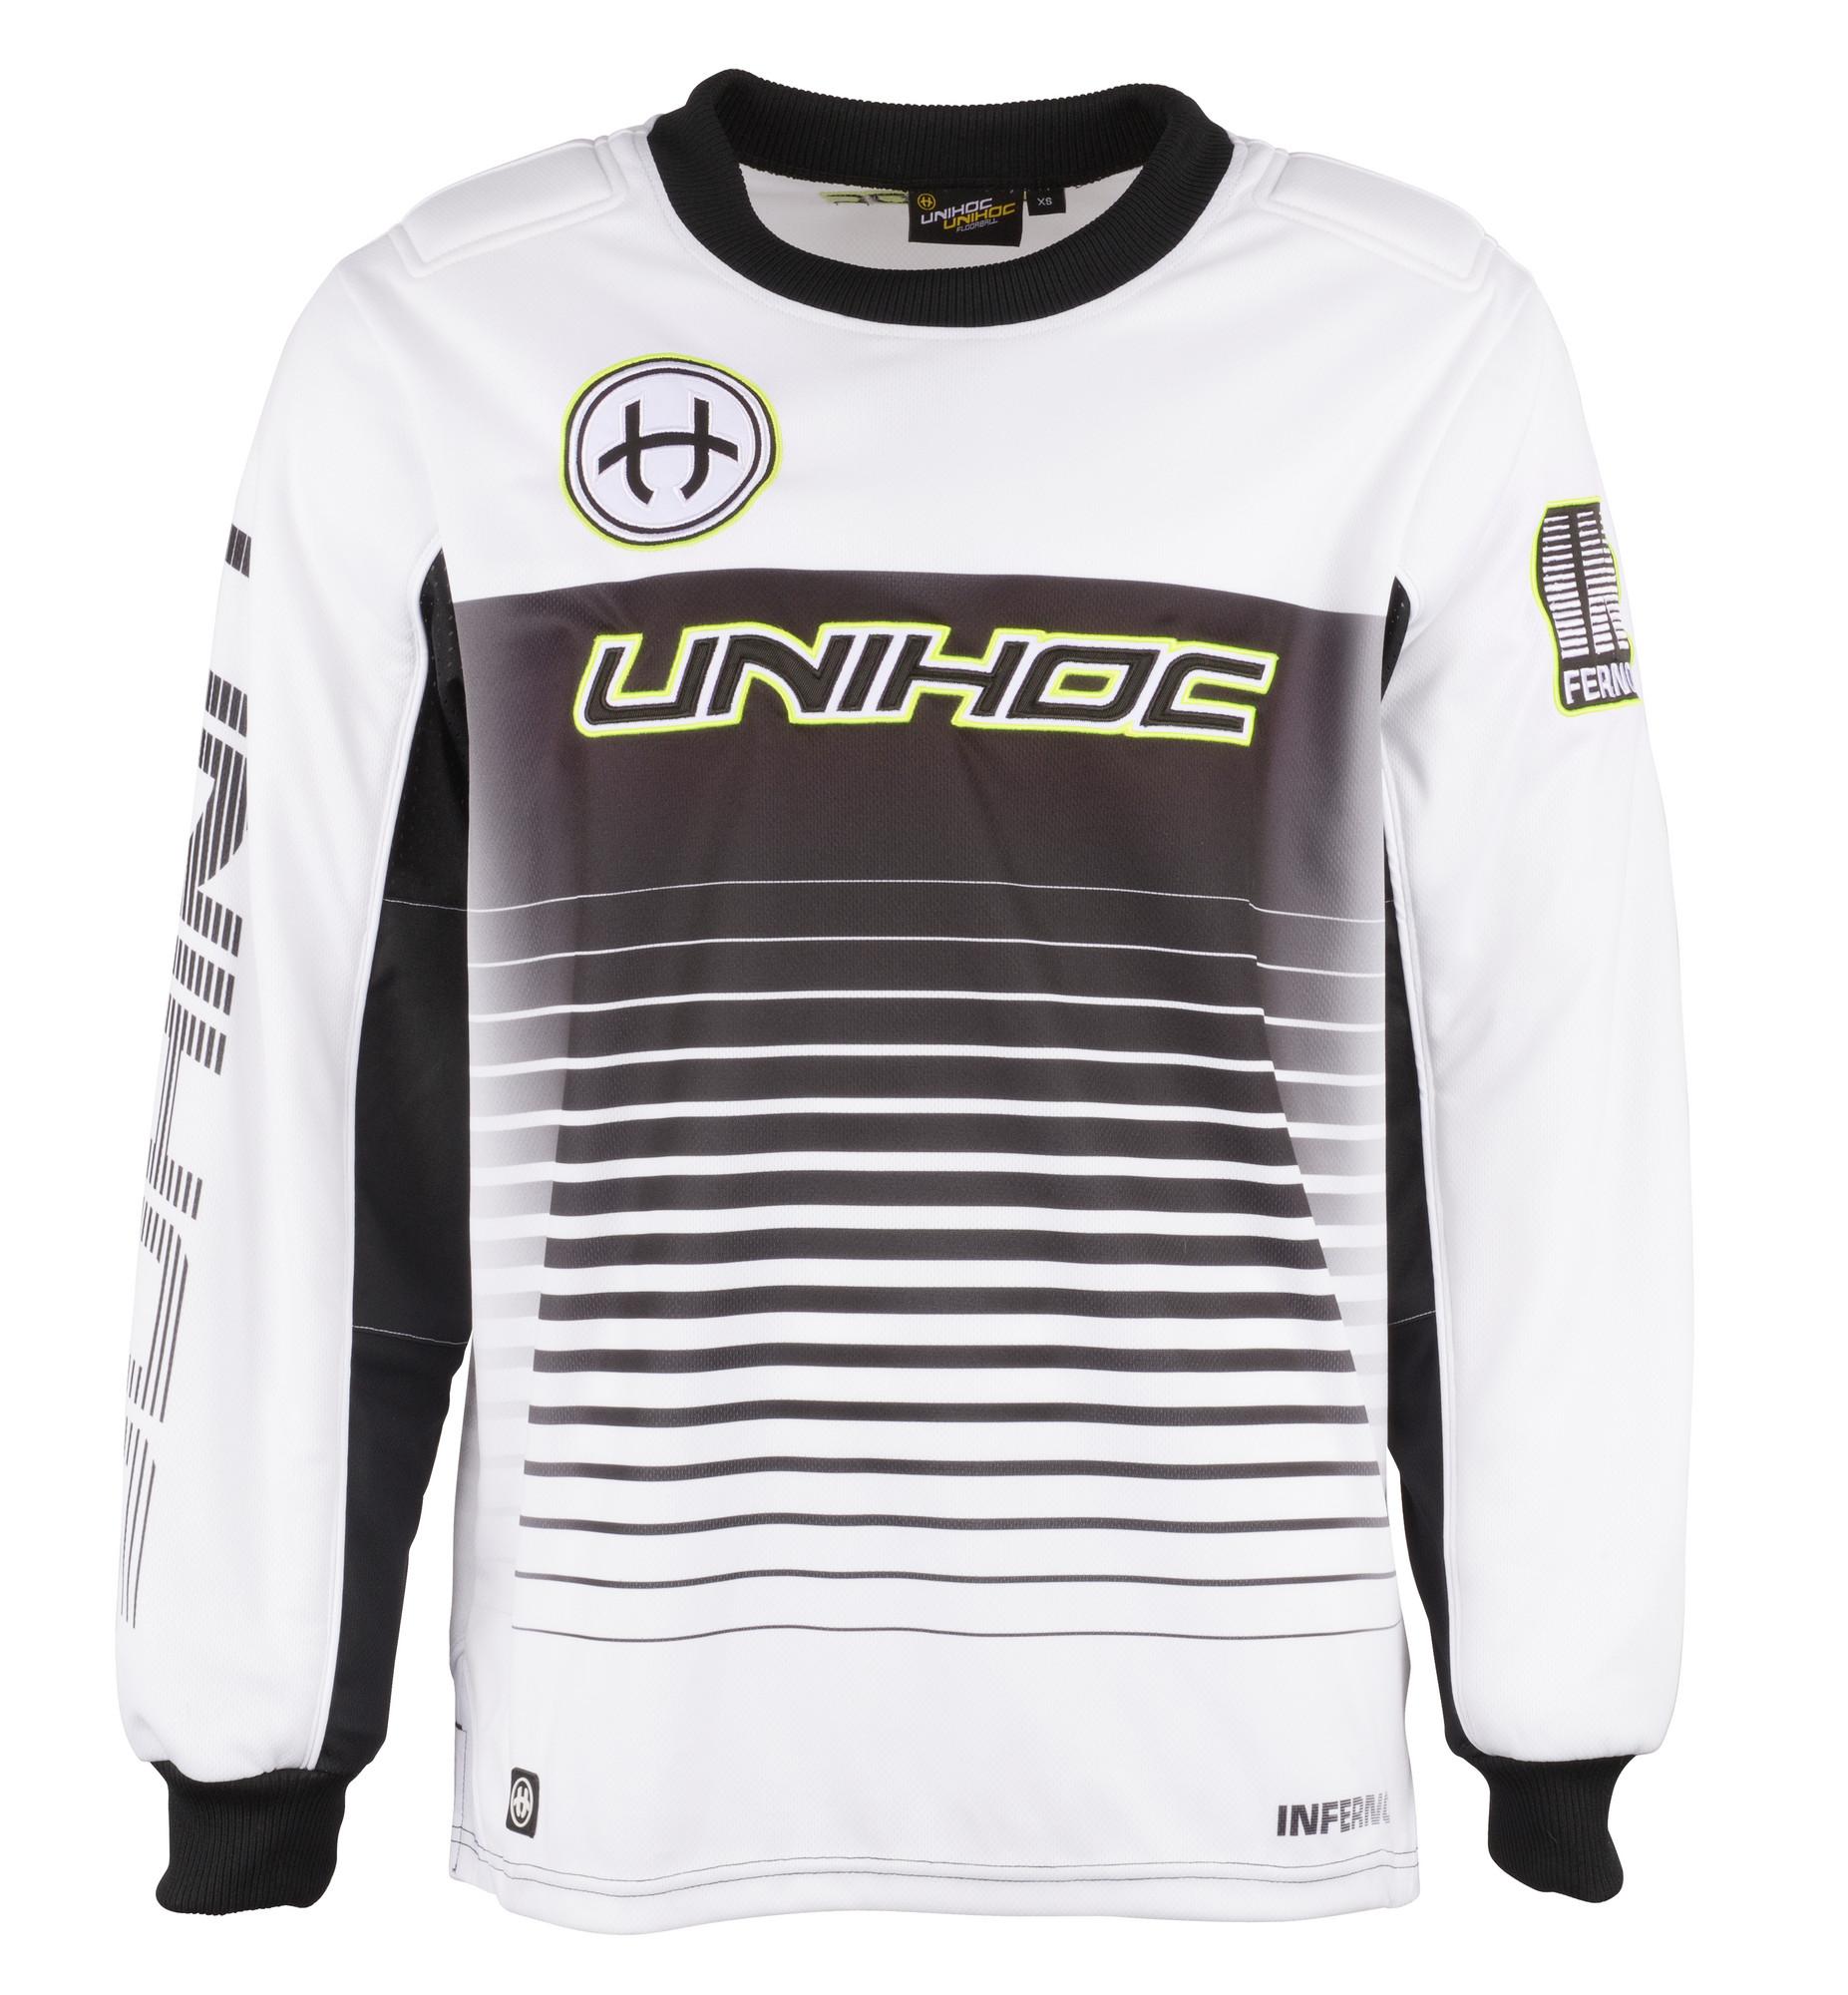 5d0b90bf6d2 Unihoc INFERNO white black Goalie jersey